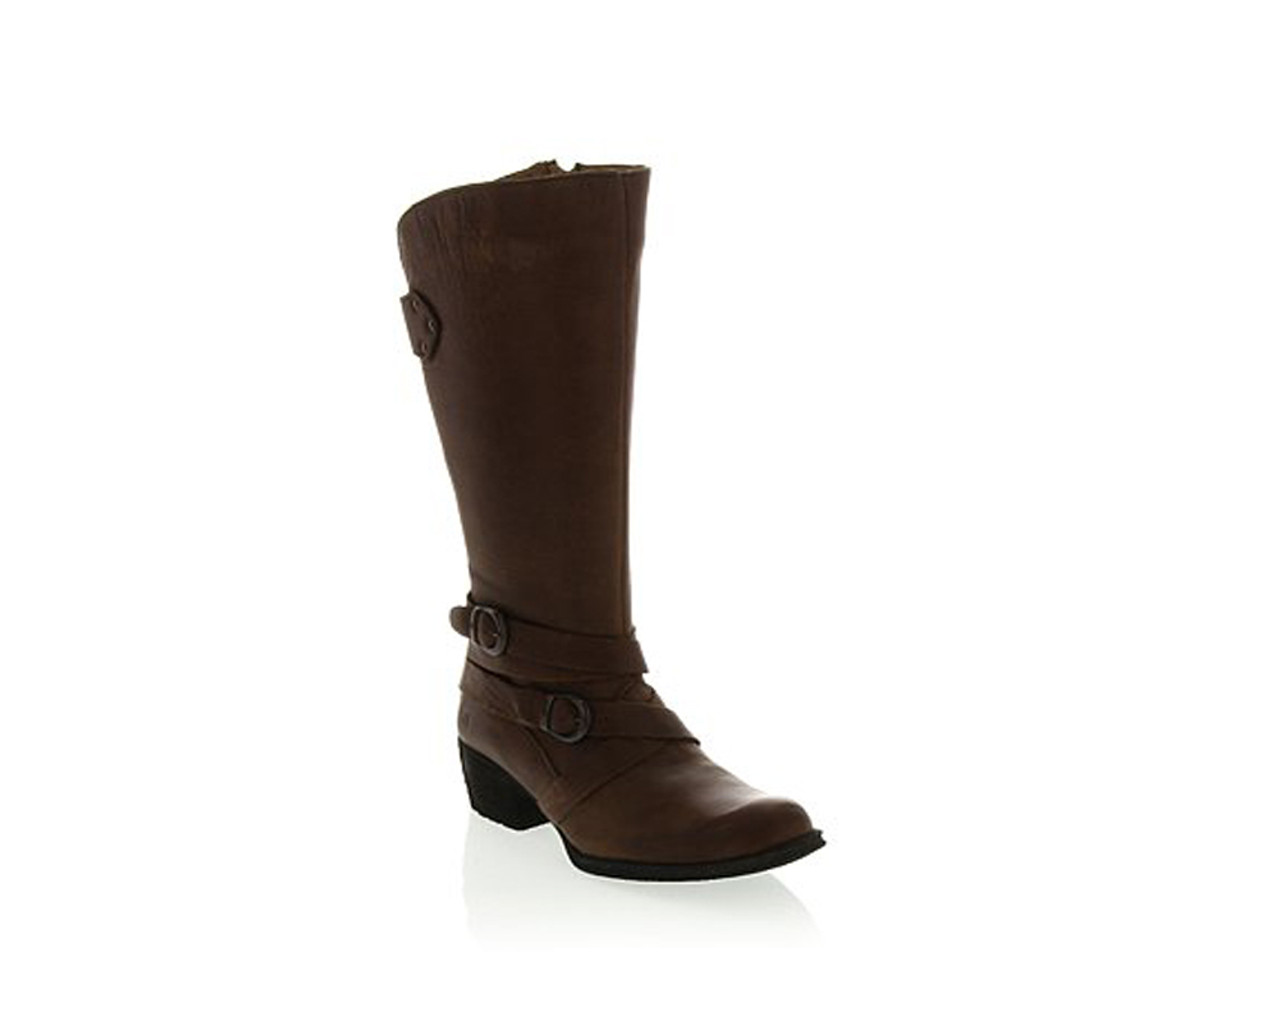 1b72c76b19a Born Women s Moana Boots Tan - Shop now   Shoolu.com